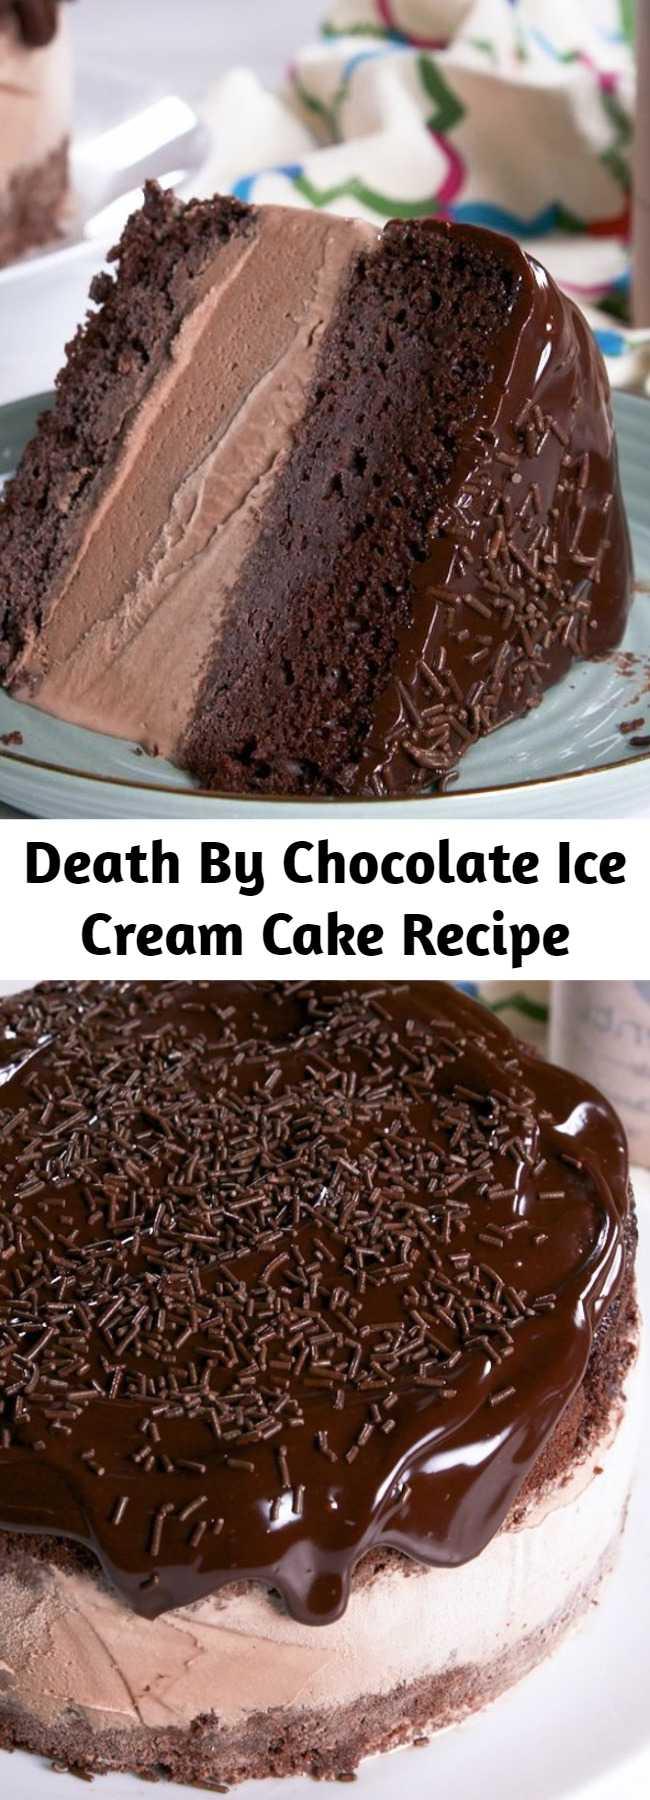 Death By Chocolate Ice Cream Cake Recipe - Death By Chocolate Ice Cream Cake is one of the finer things in life. Tastes Like Heaven Delish.